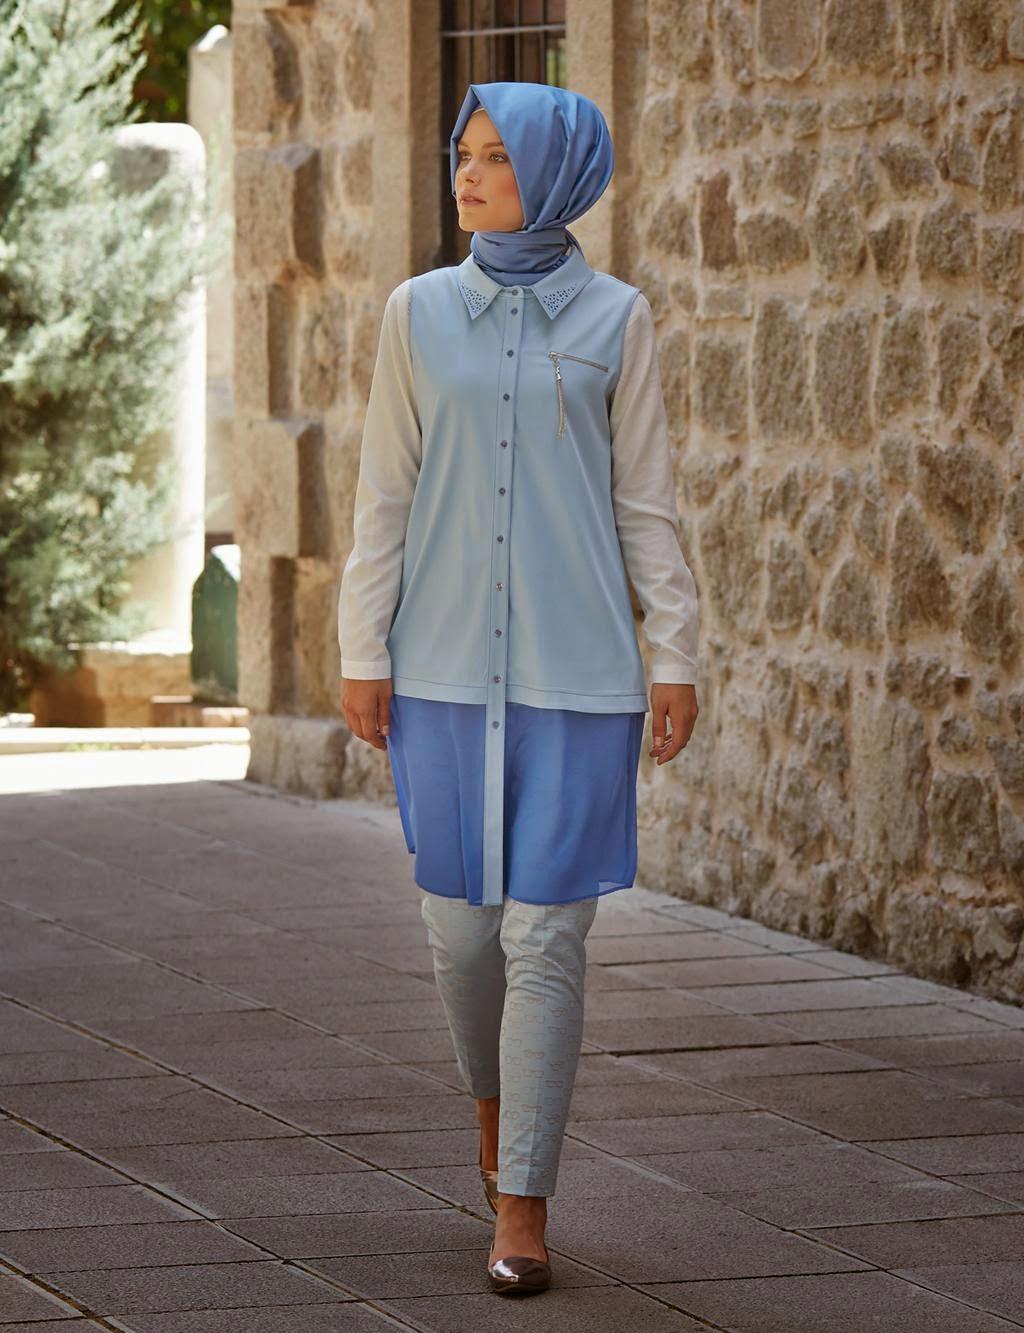 Mars 2015 Hijab Chic Turque Style And Fashion